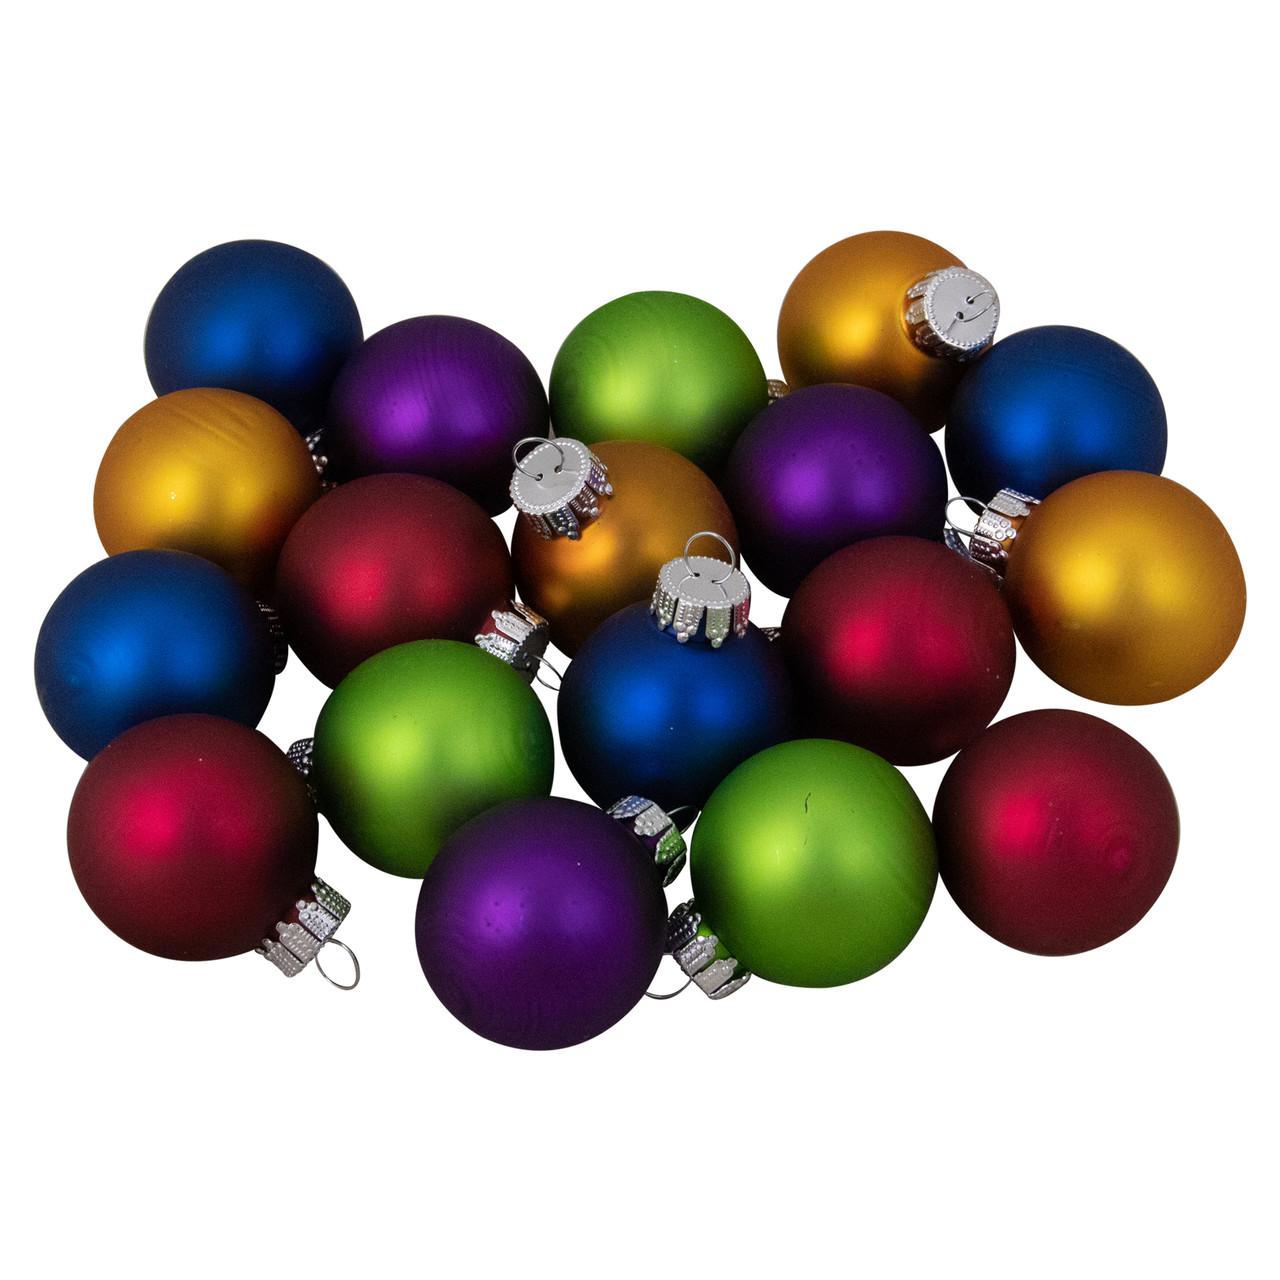 20 Piece Multi Color Vibrant Glass Ball Christmas Ornament Set 20.20